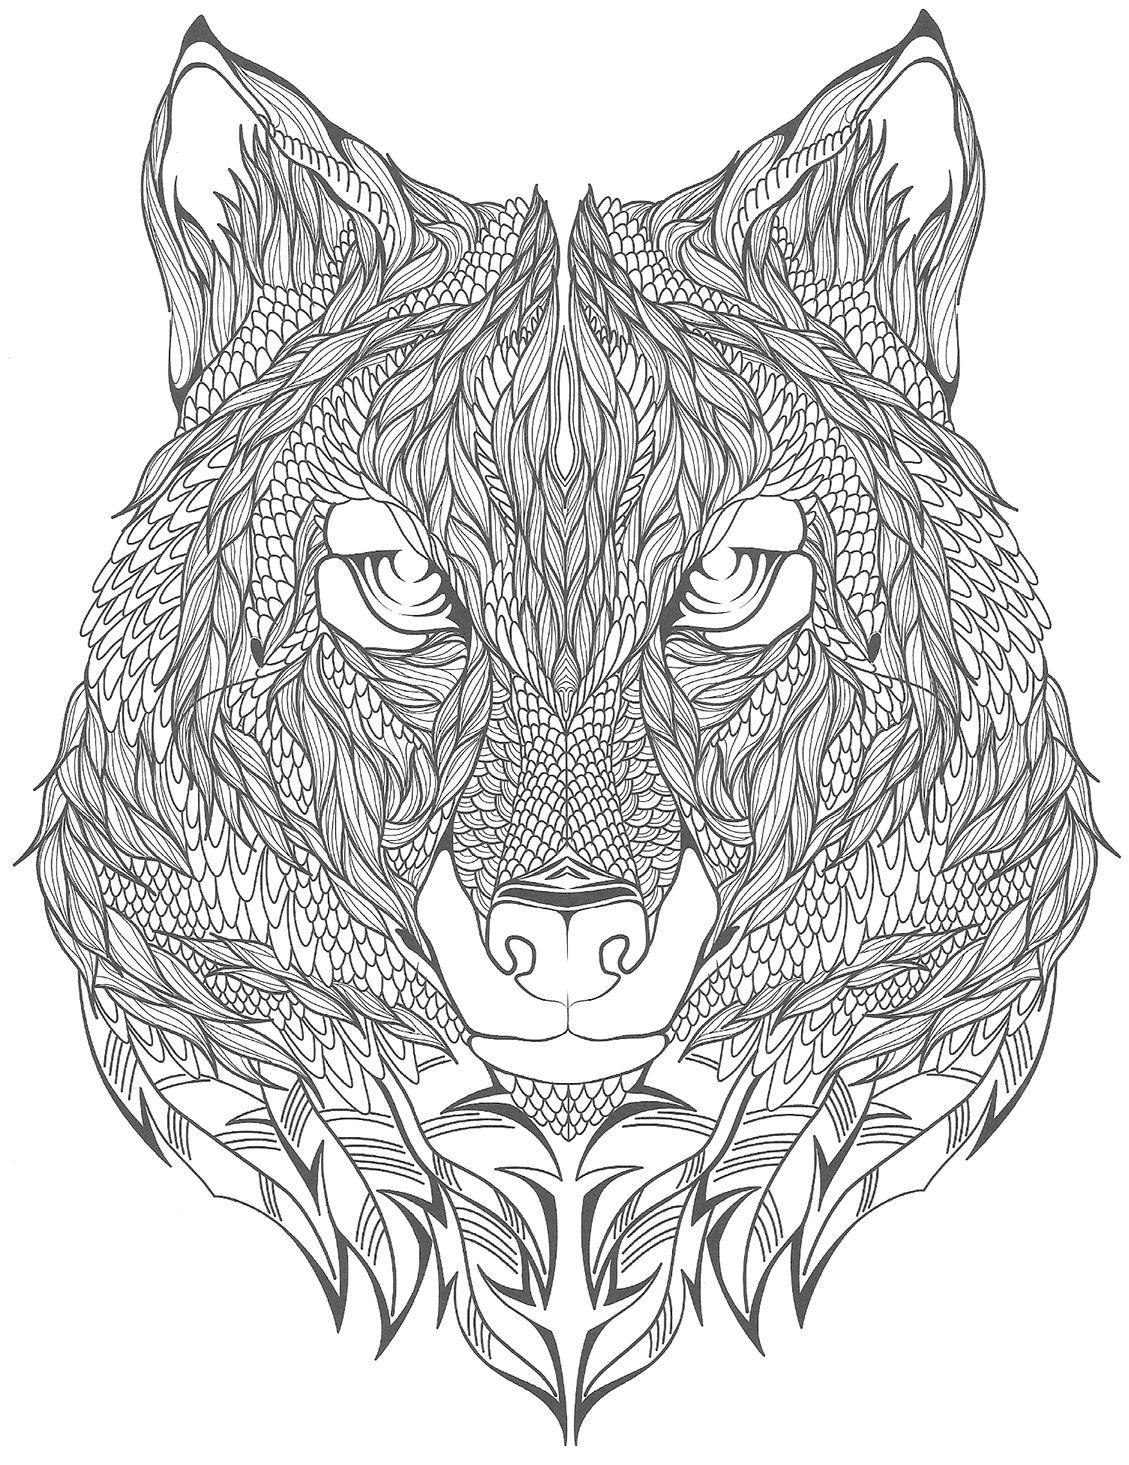 tatouage loup à colorier | Drawings | Pinterest | Tatoo, Mandala and ...